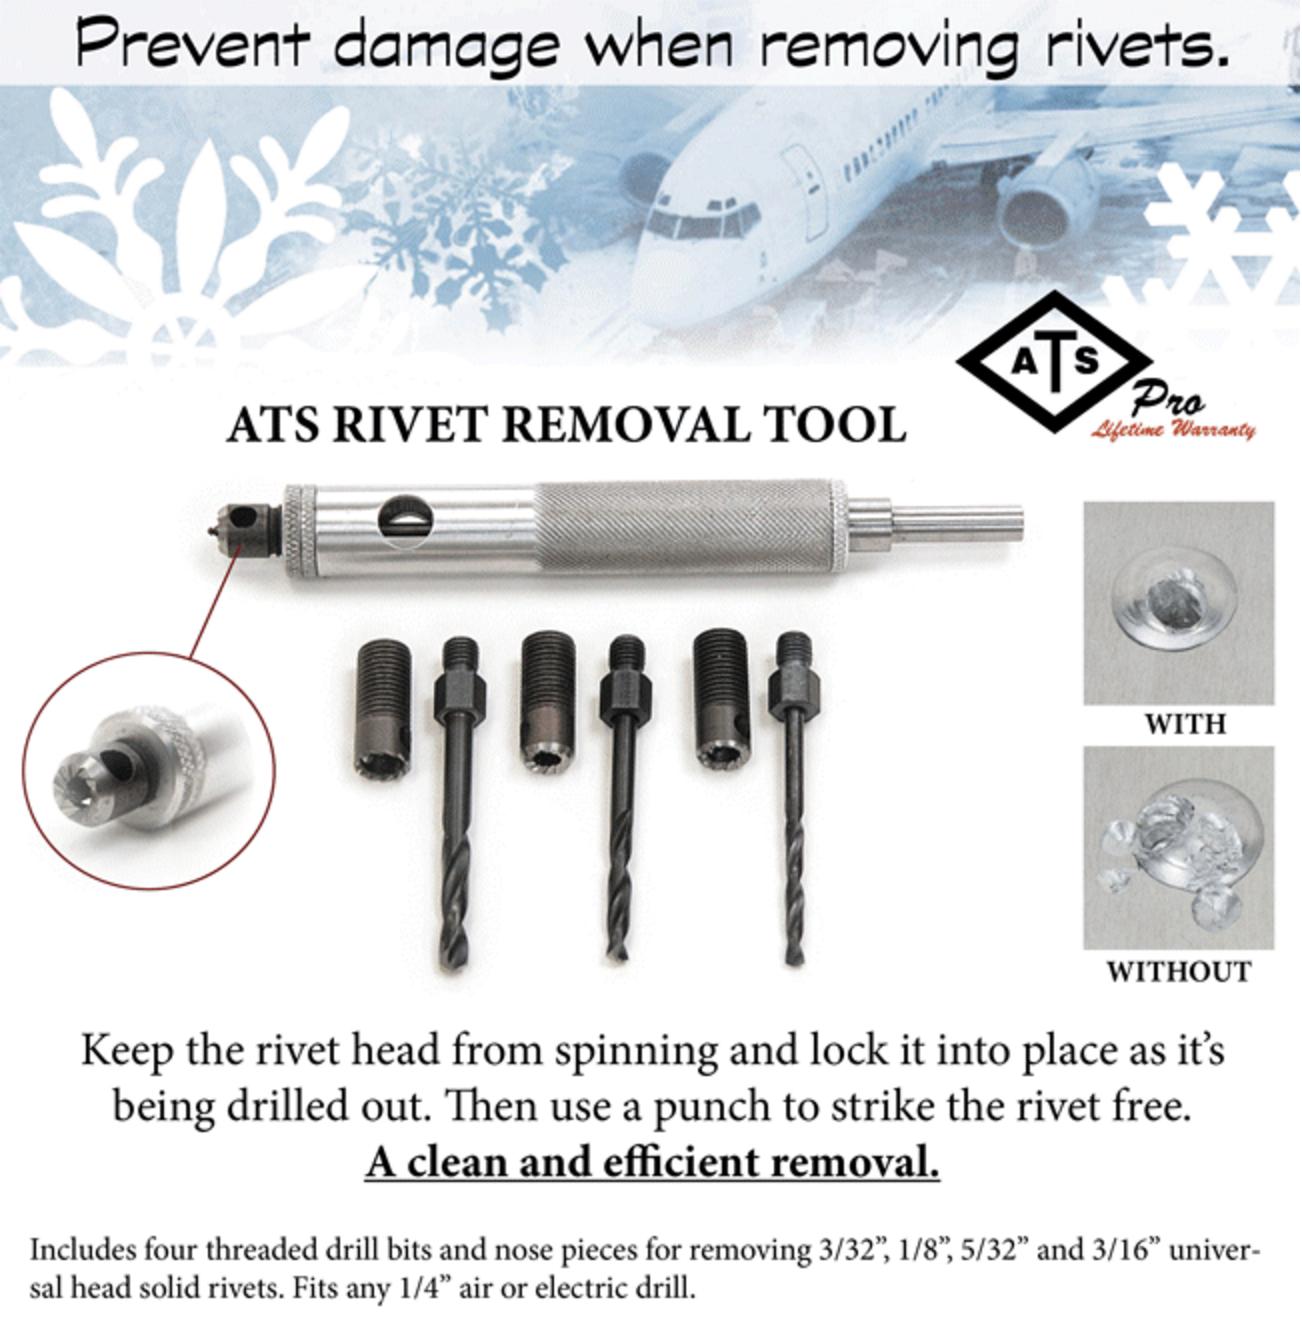 ATS rivet removal tool